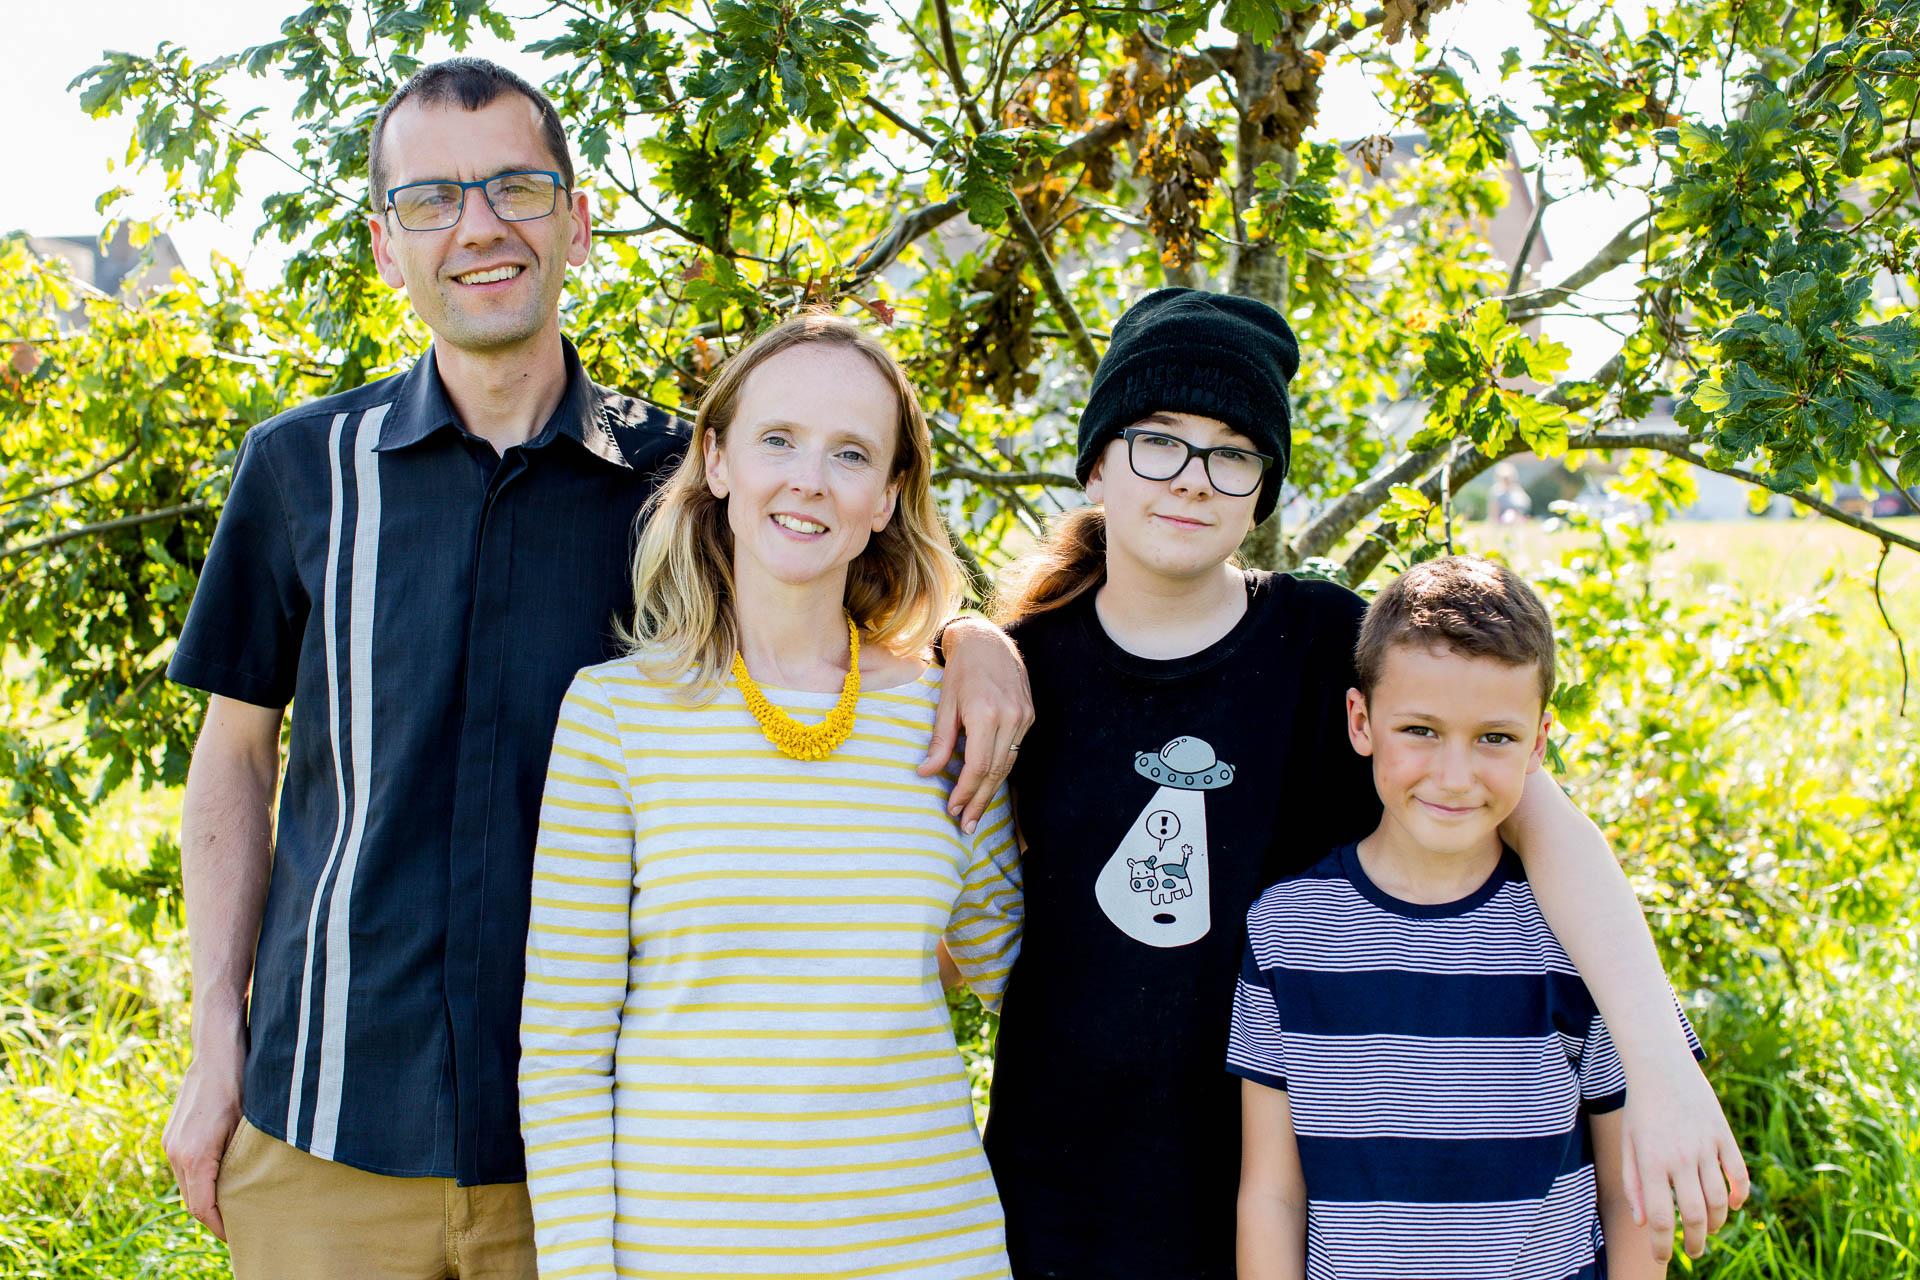 family portrait outdoors